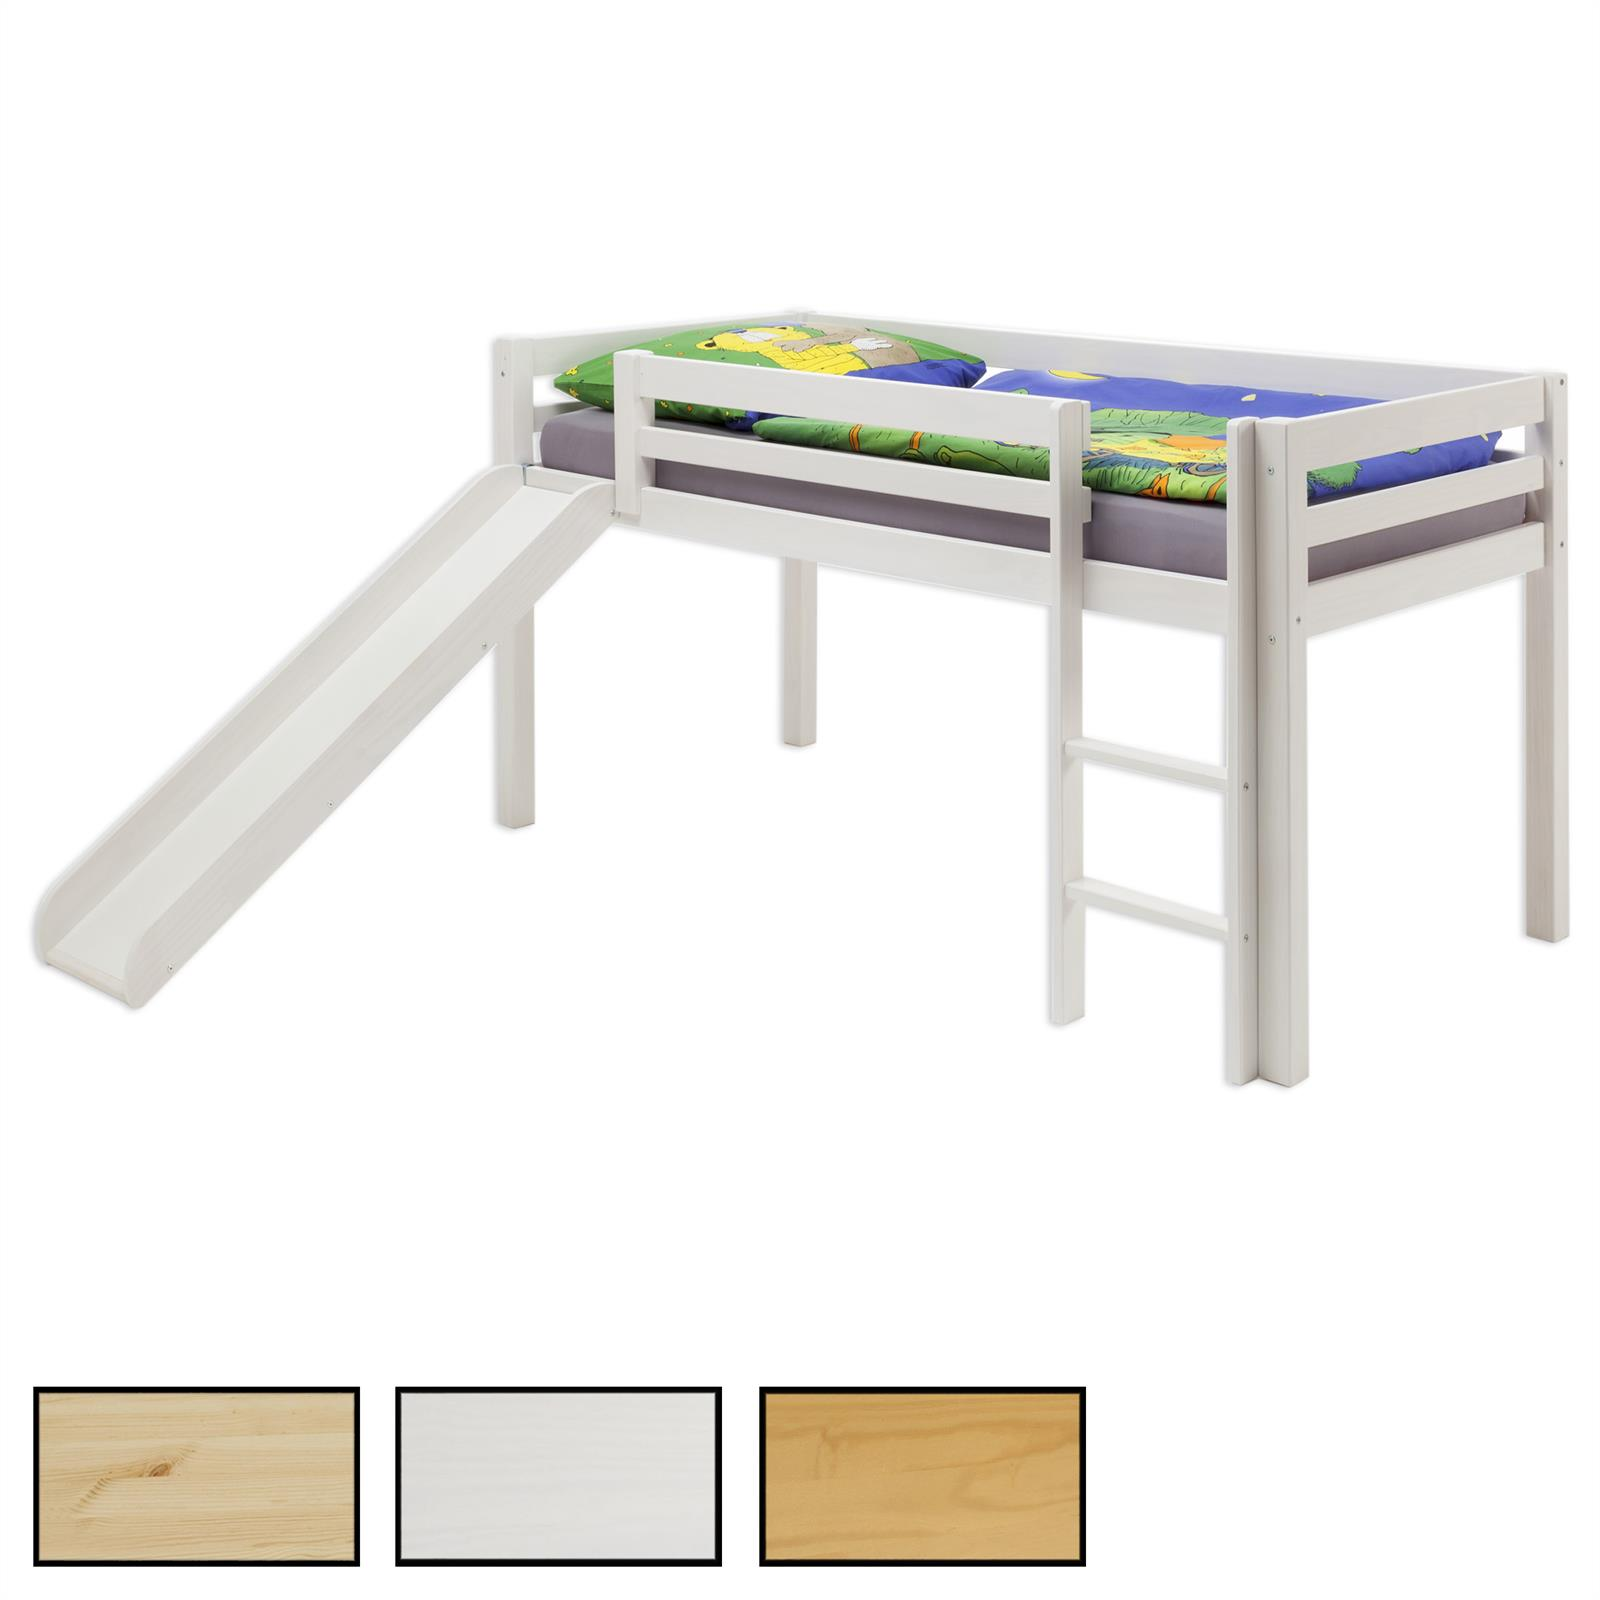 hochbett mit rutsche max in 3 farben mobilia24. Black Bedroom Furniture Sets. Home Design Ideas